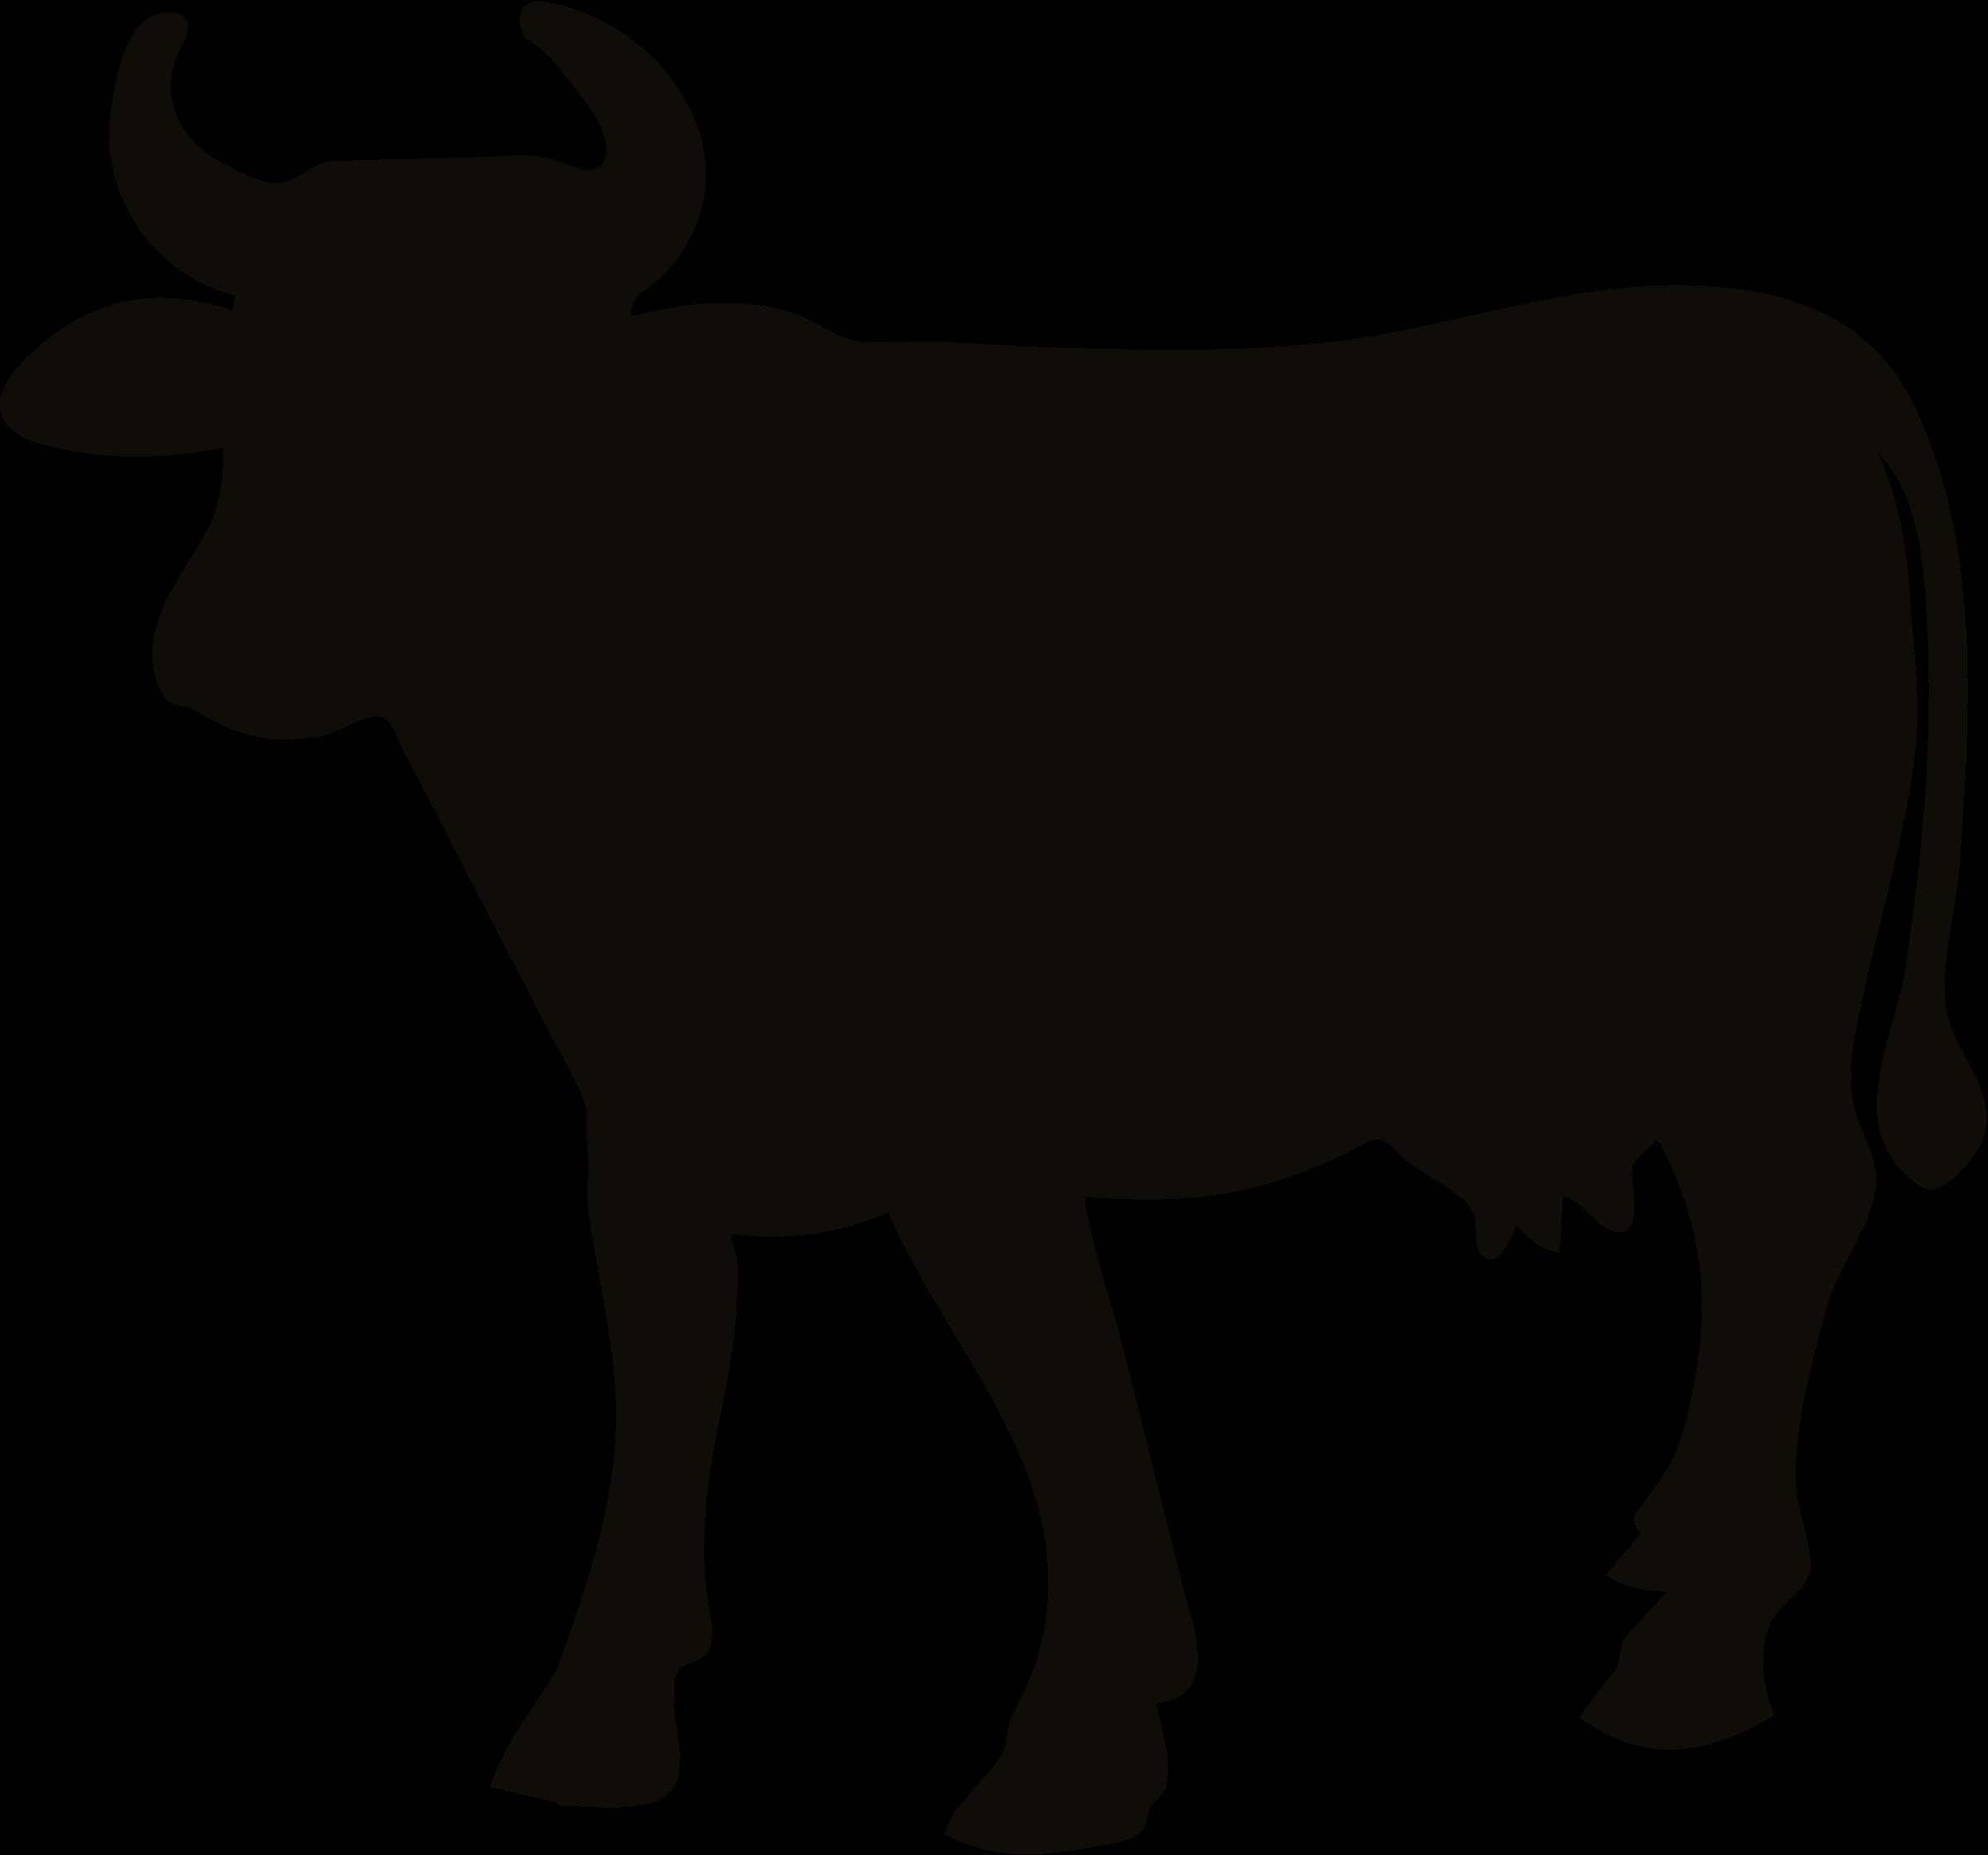 2400x2239 Clipart Cow Silhouette